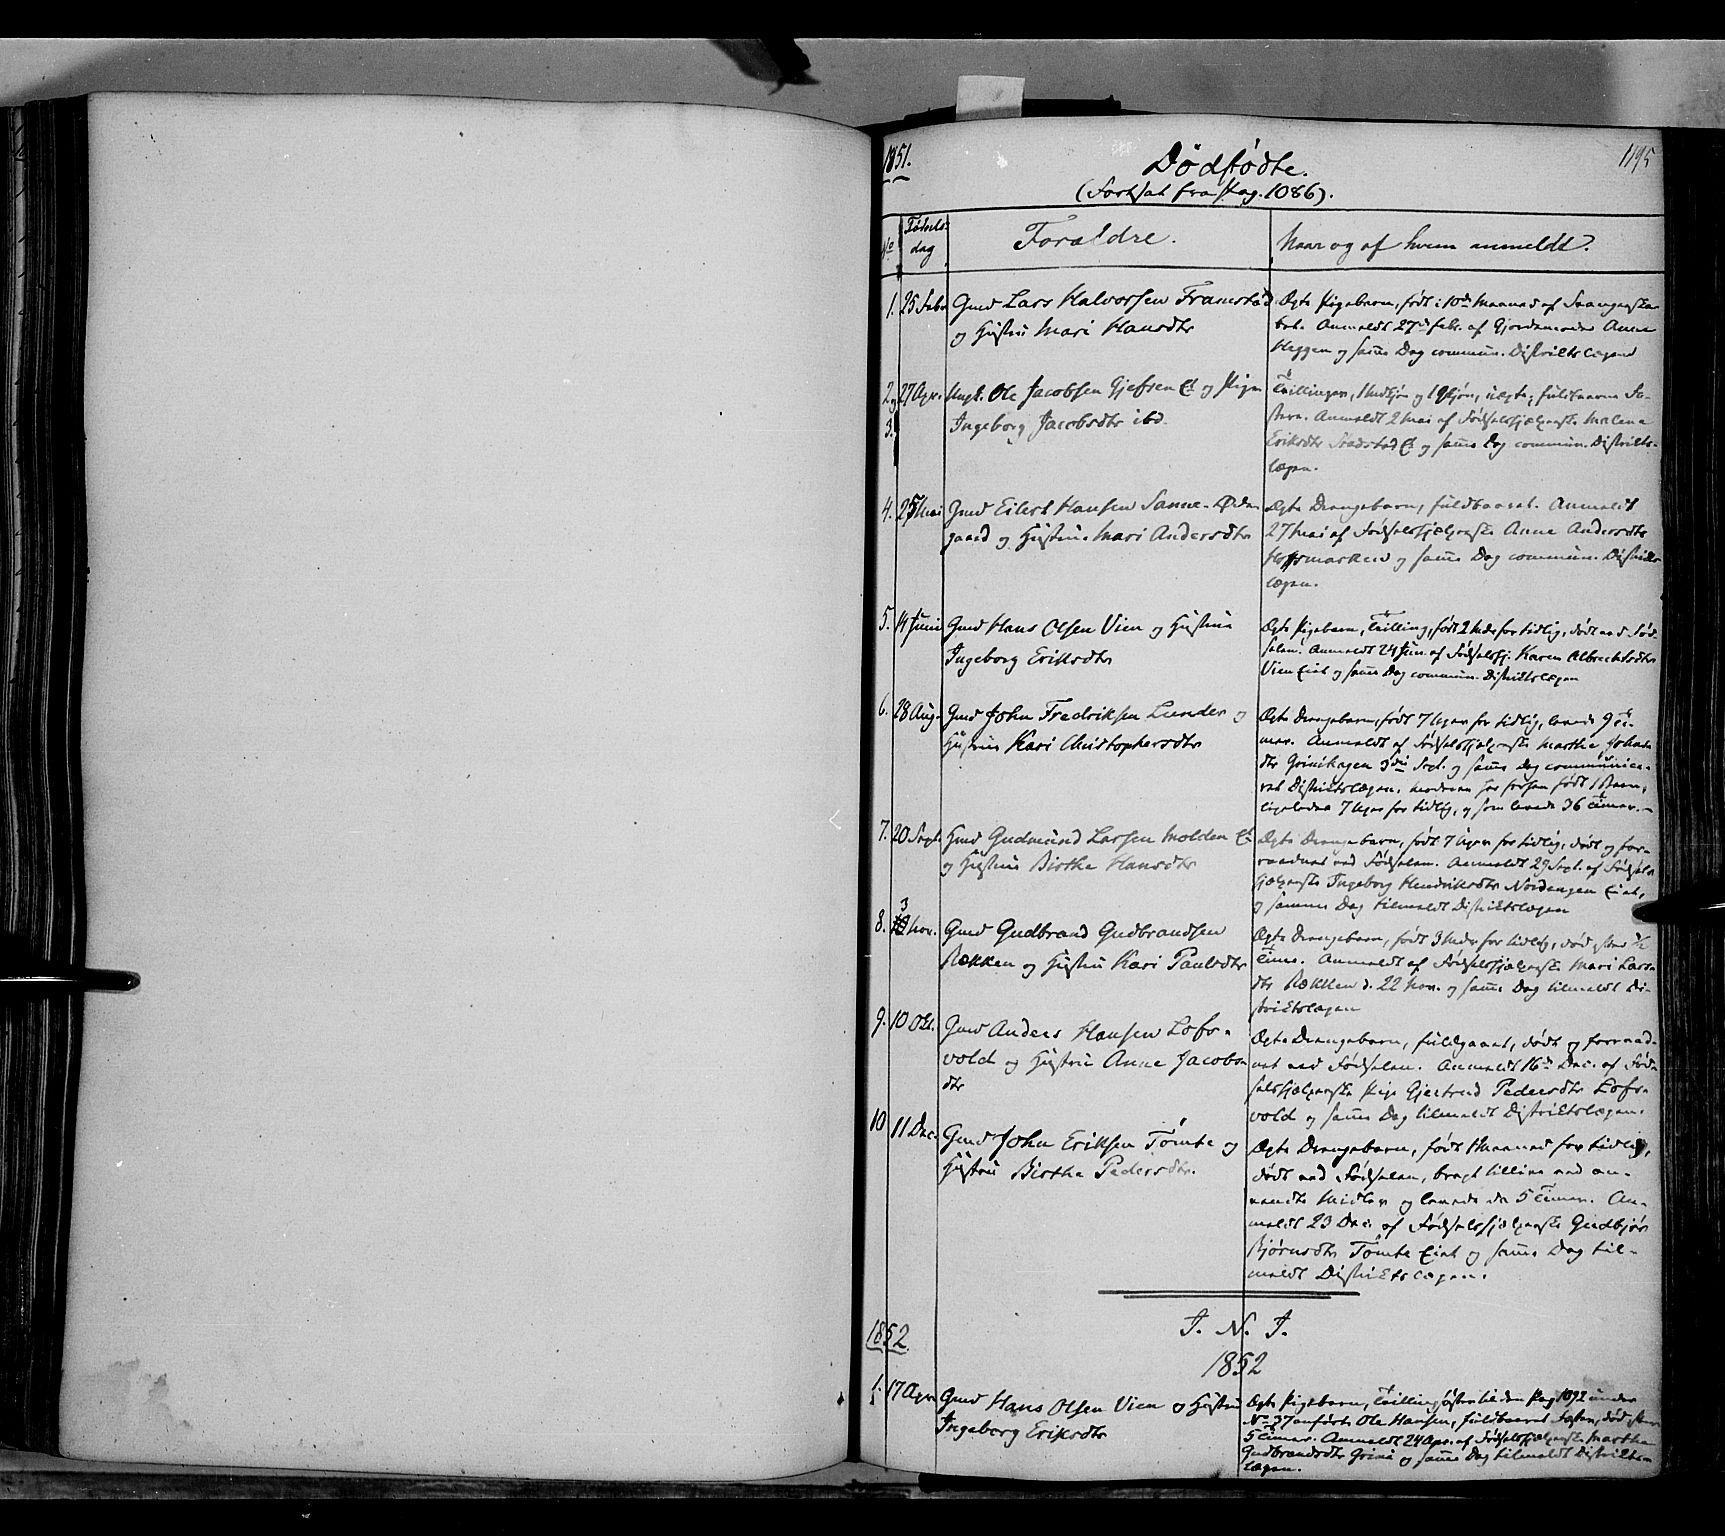 SAH, Gran prestekontor, Ministerialbok nr. 11, 1842-1856, s. 1194-1195